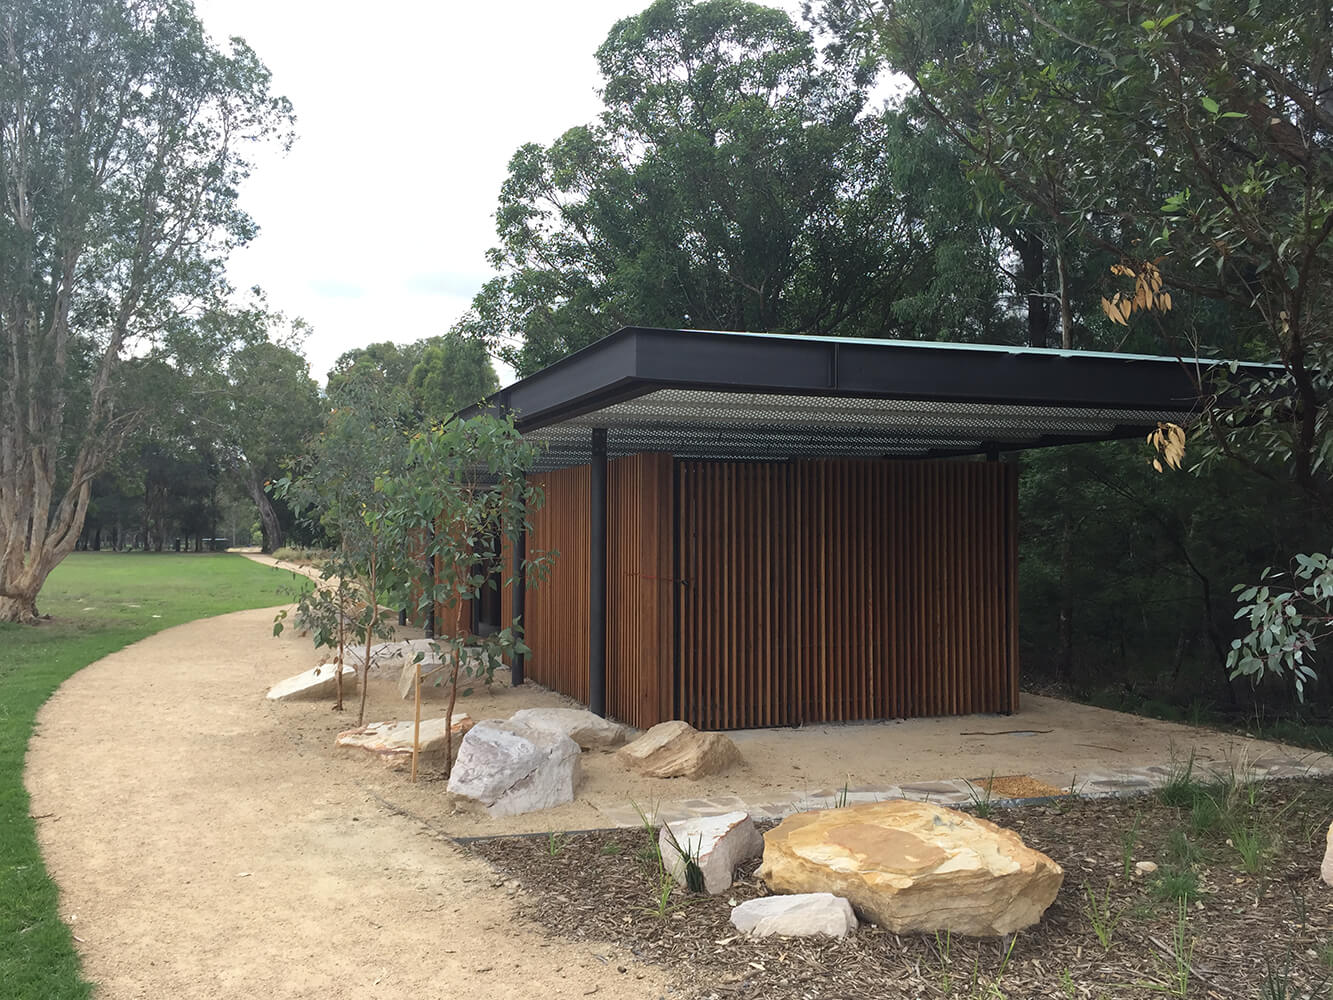 Parramatta Park Shelters and Amenities